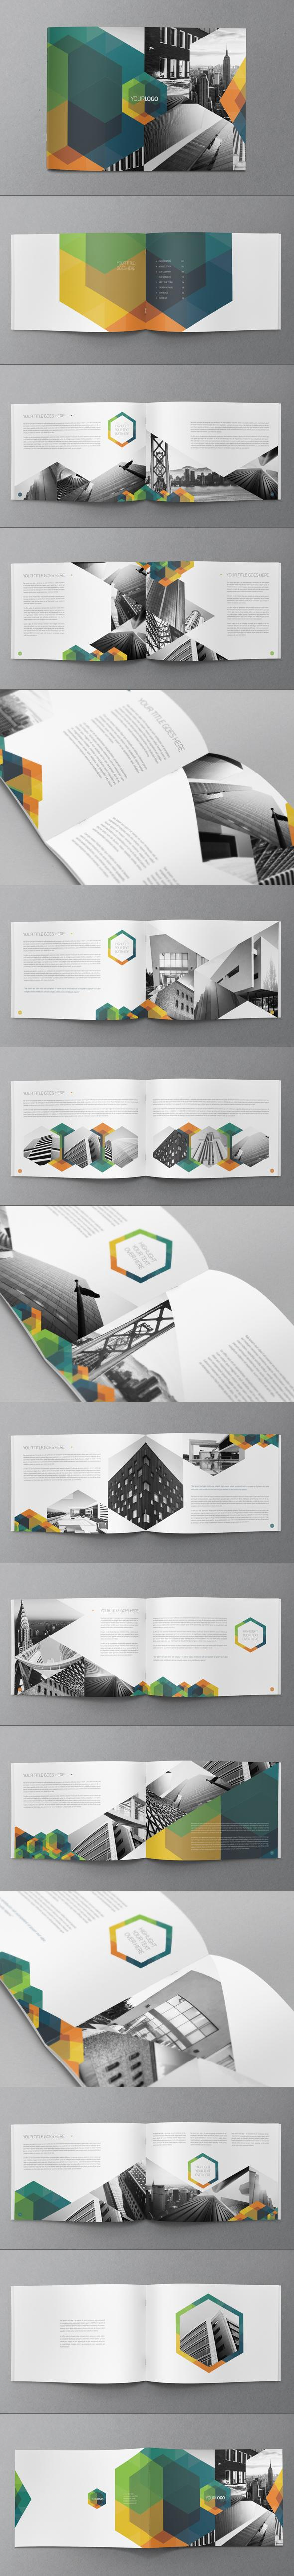 Hexo Brochure Design on